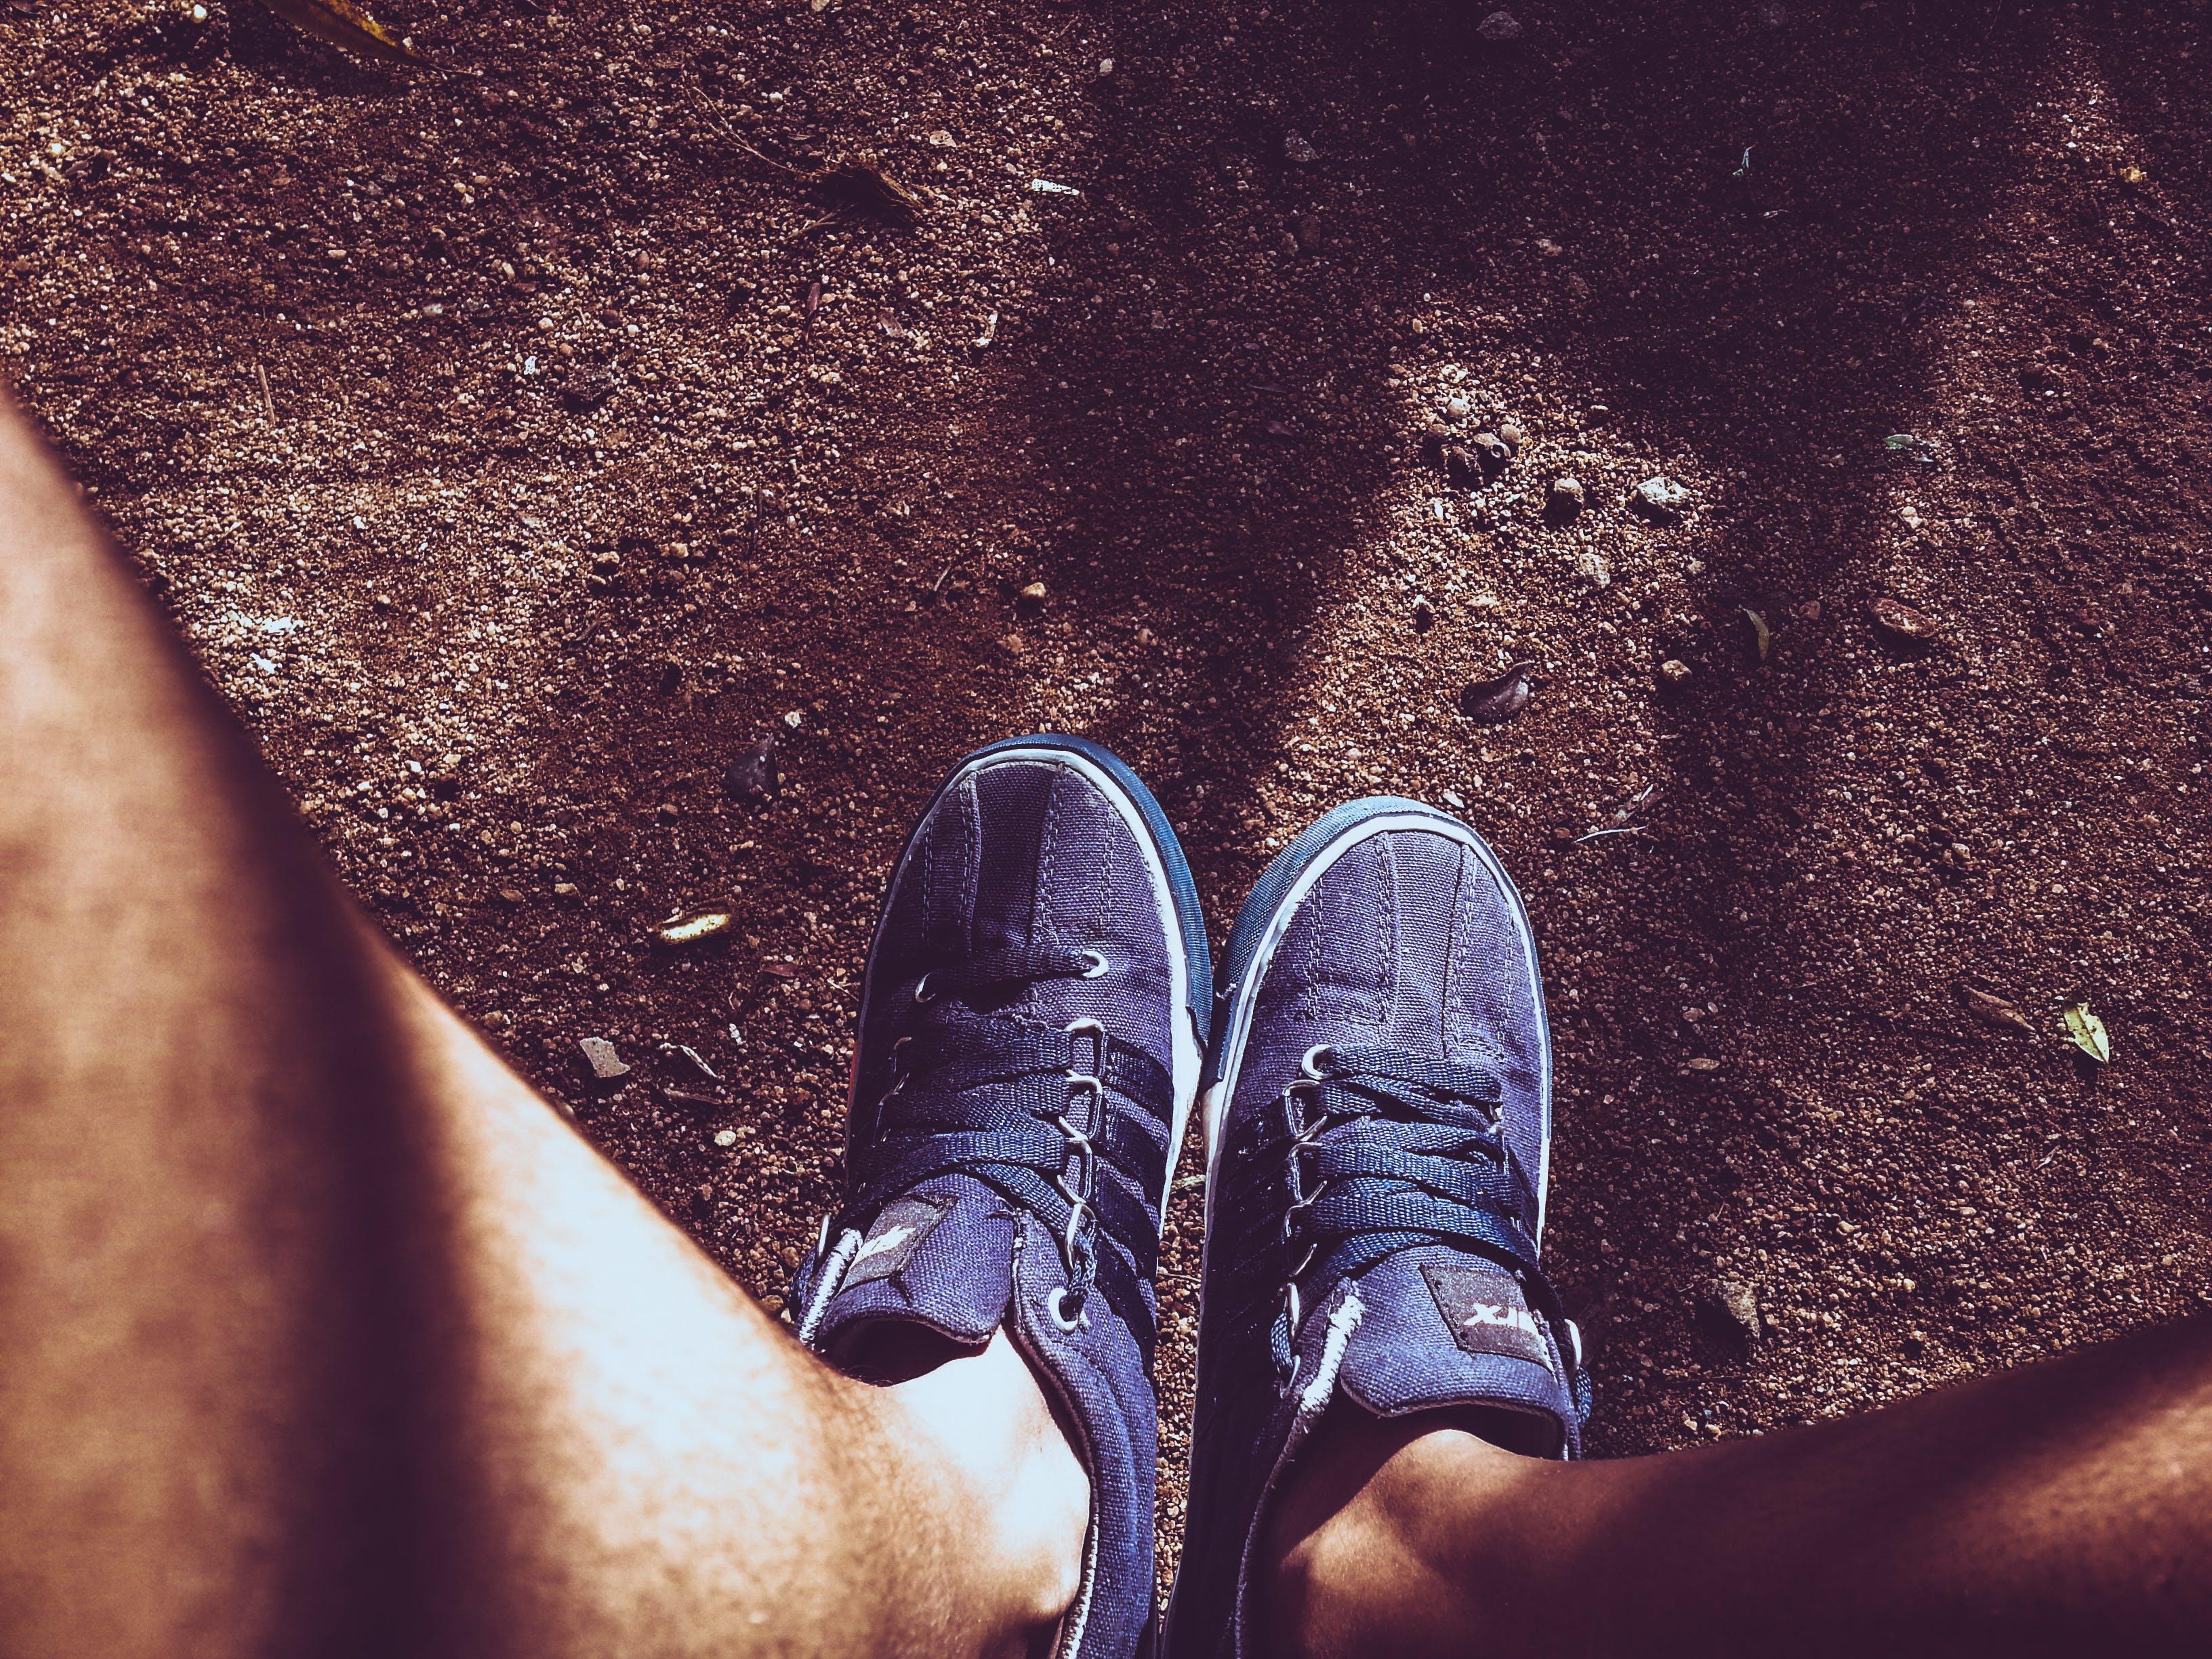 Photo of Pair of Blue Sneakers